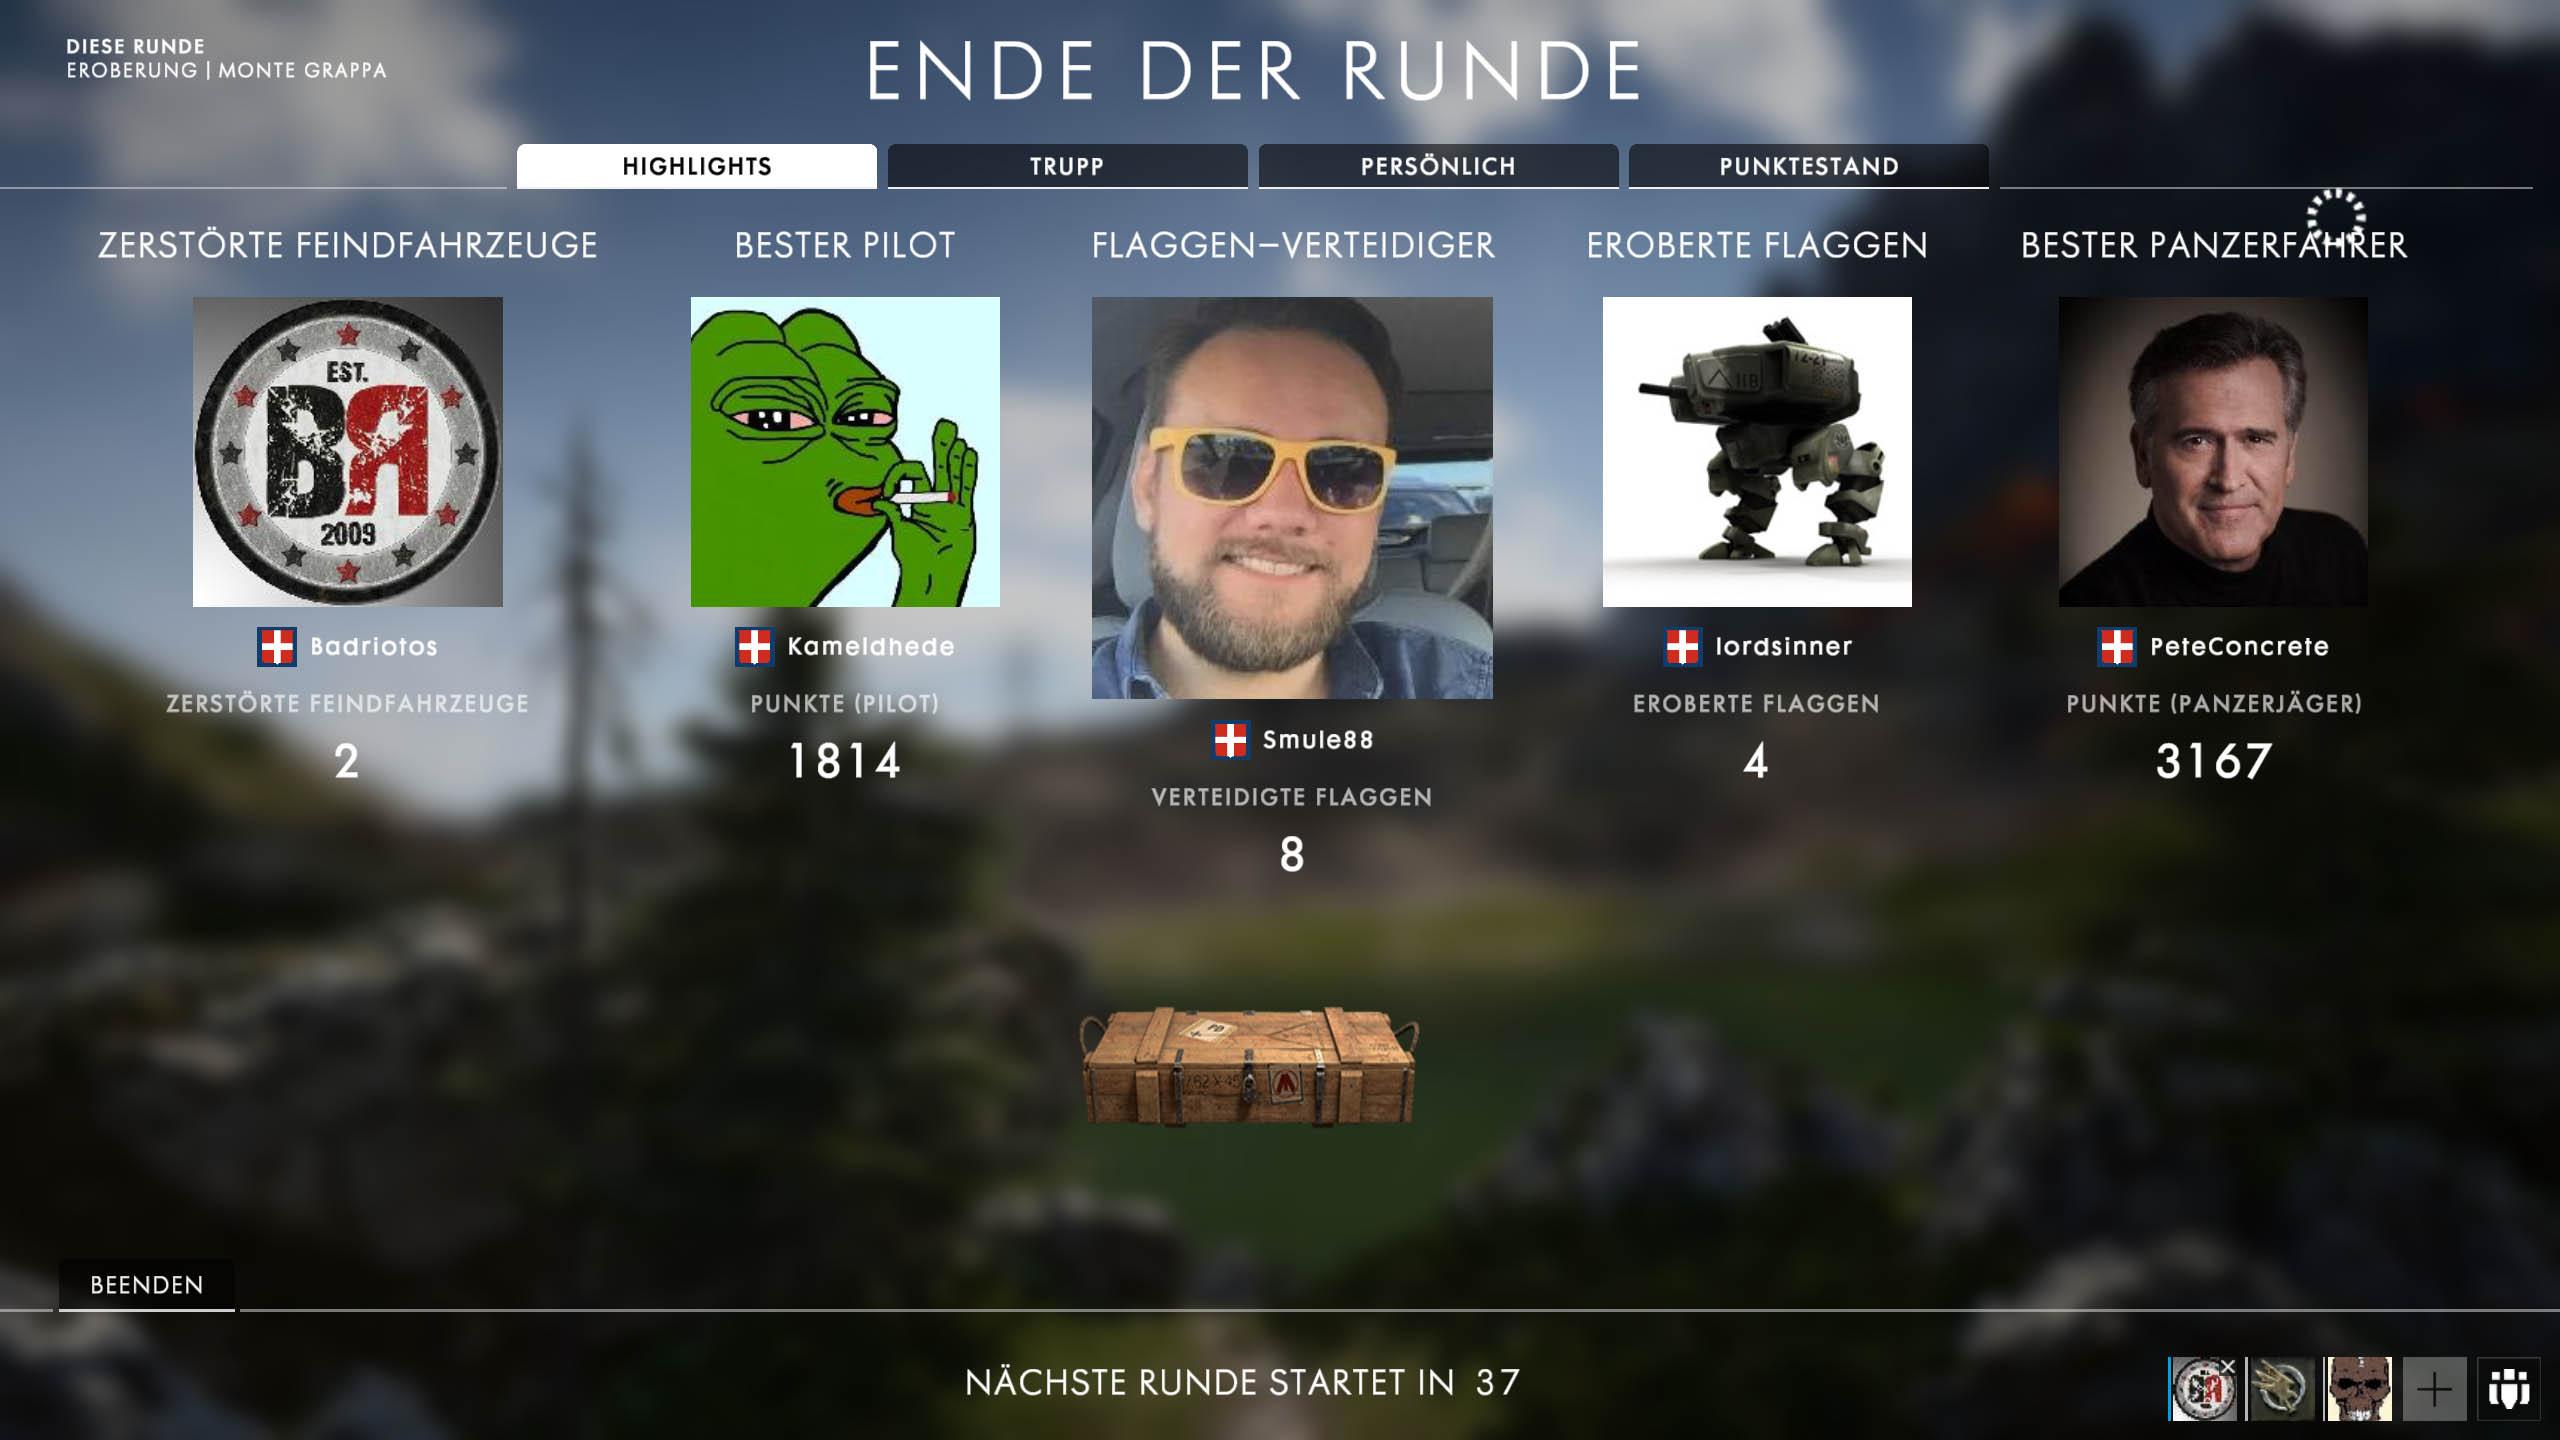 Battlefield 1 - 7